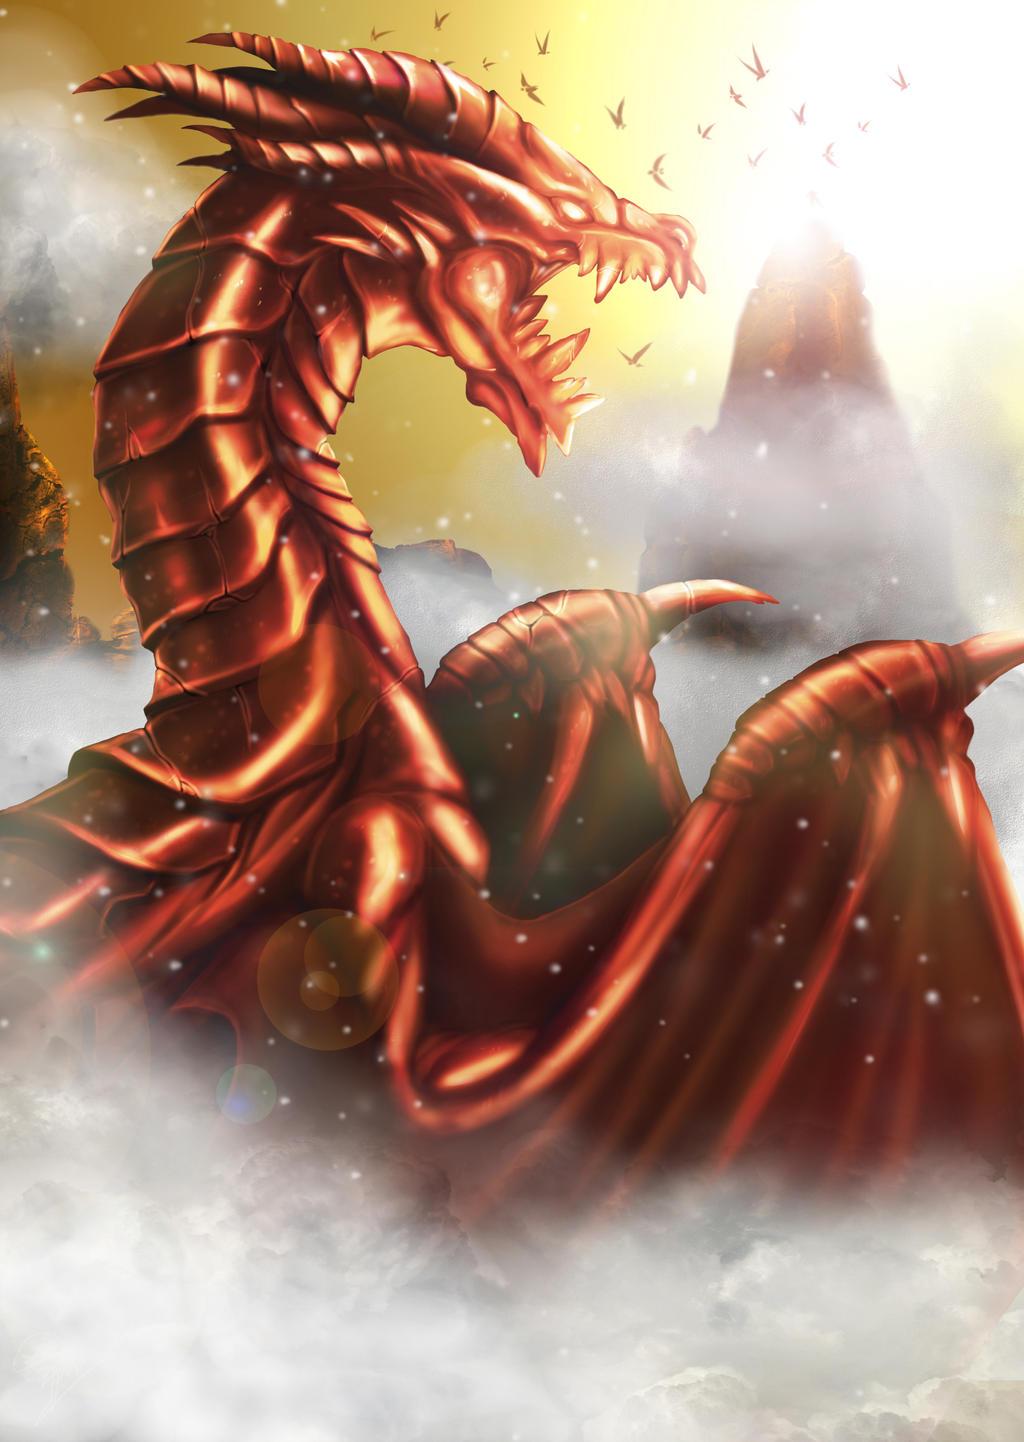 ... Chocolate Dragon(Valentine) By Tung 6458